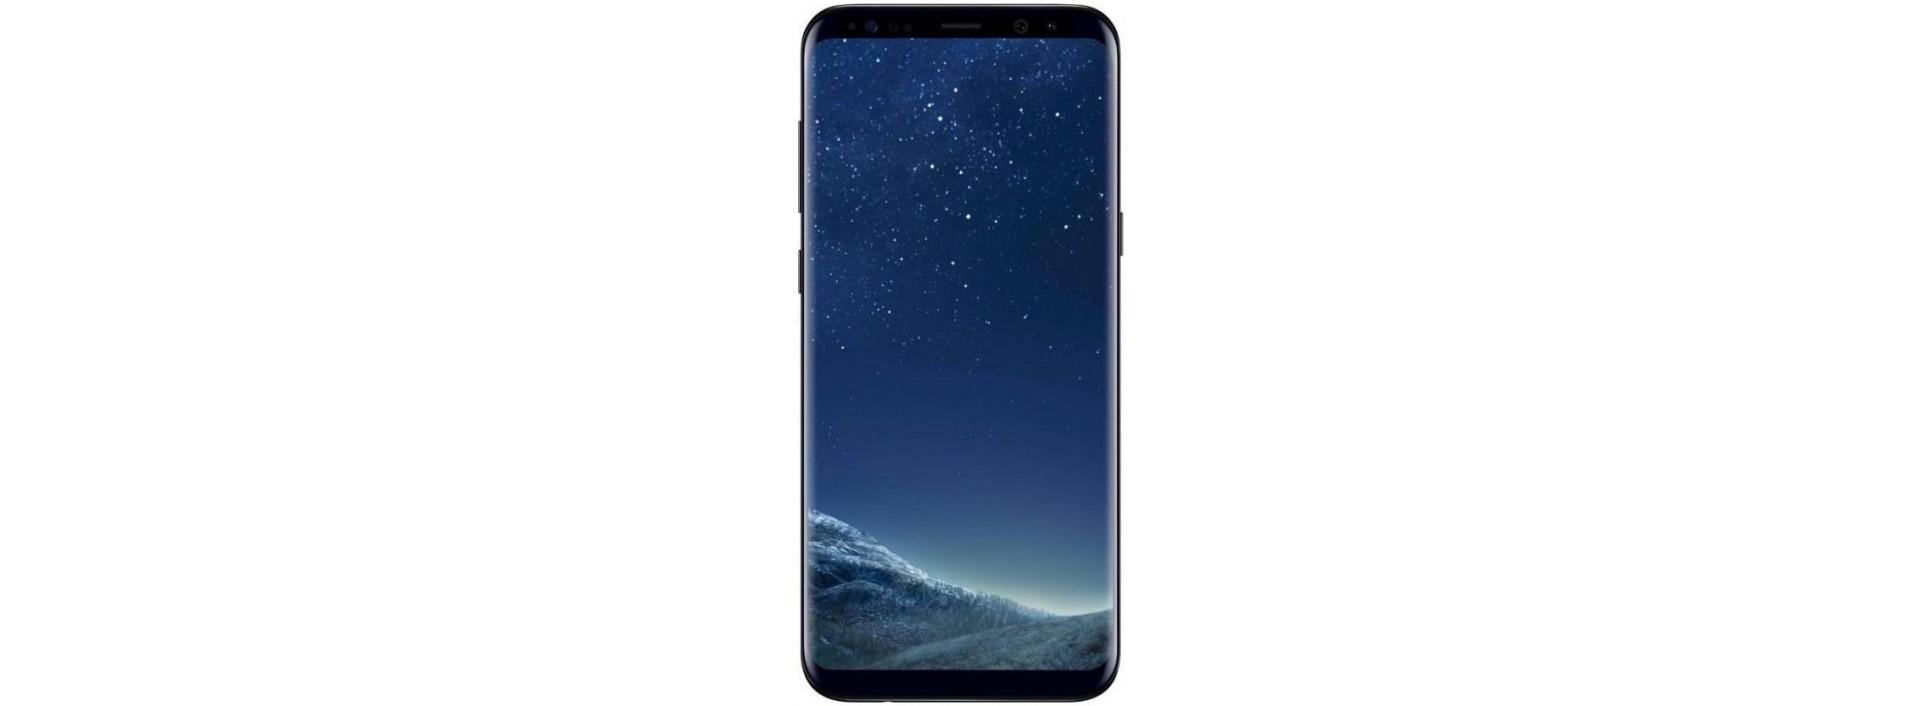 Funda para Galaxy S8 Plus